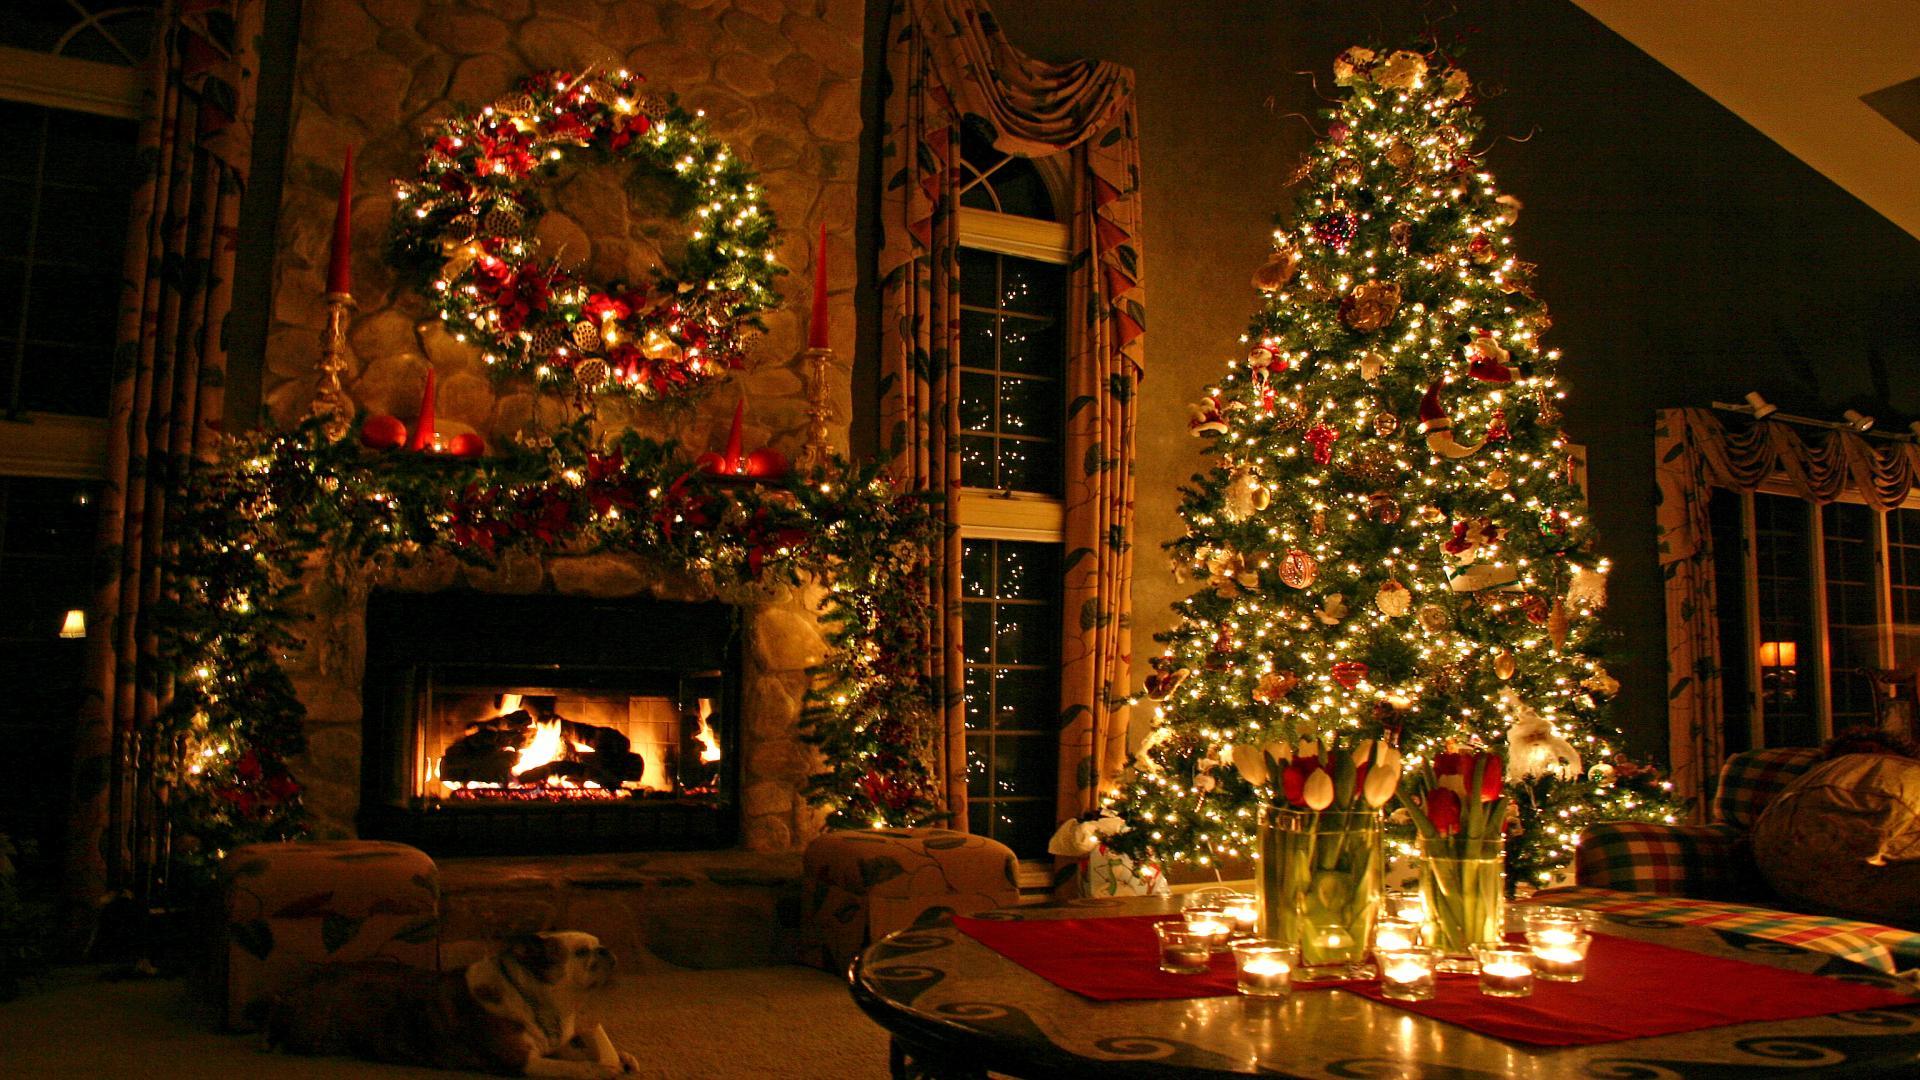 HD Christmas Wallpaper 1920x1080 - WallpaperSafari